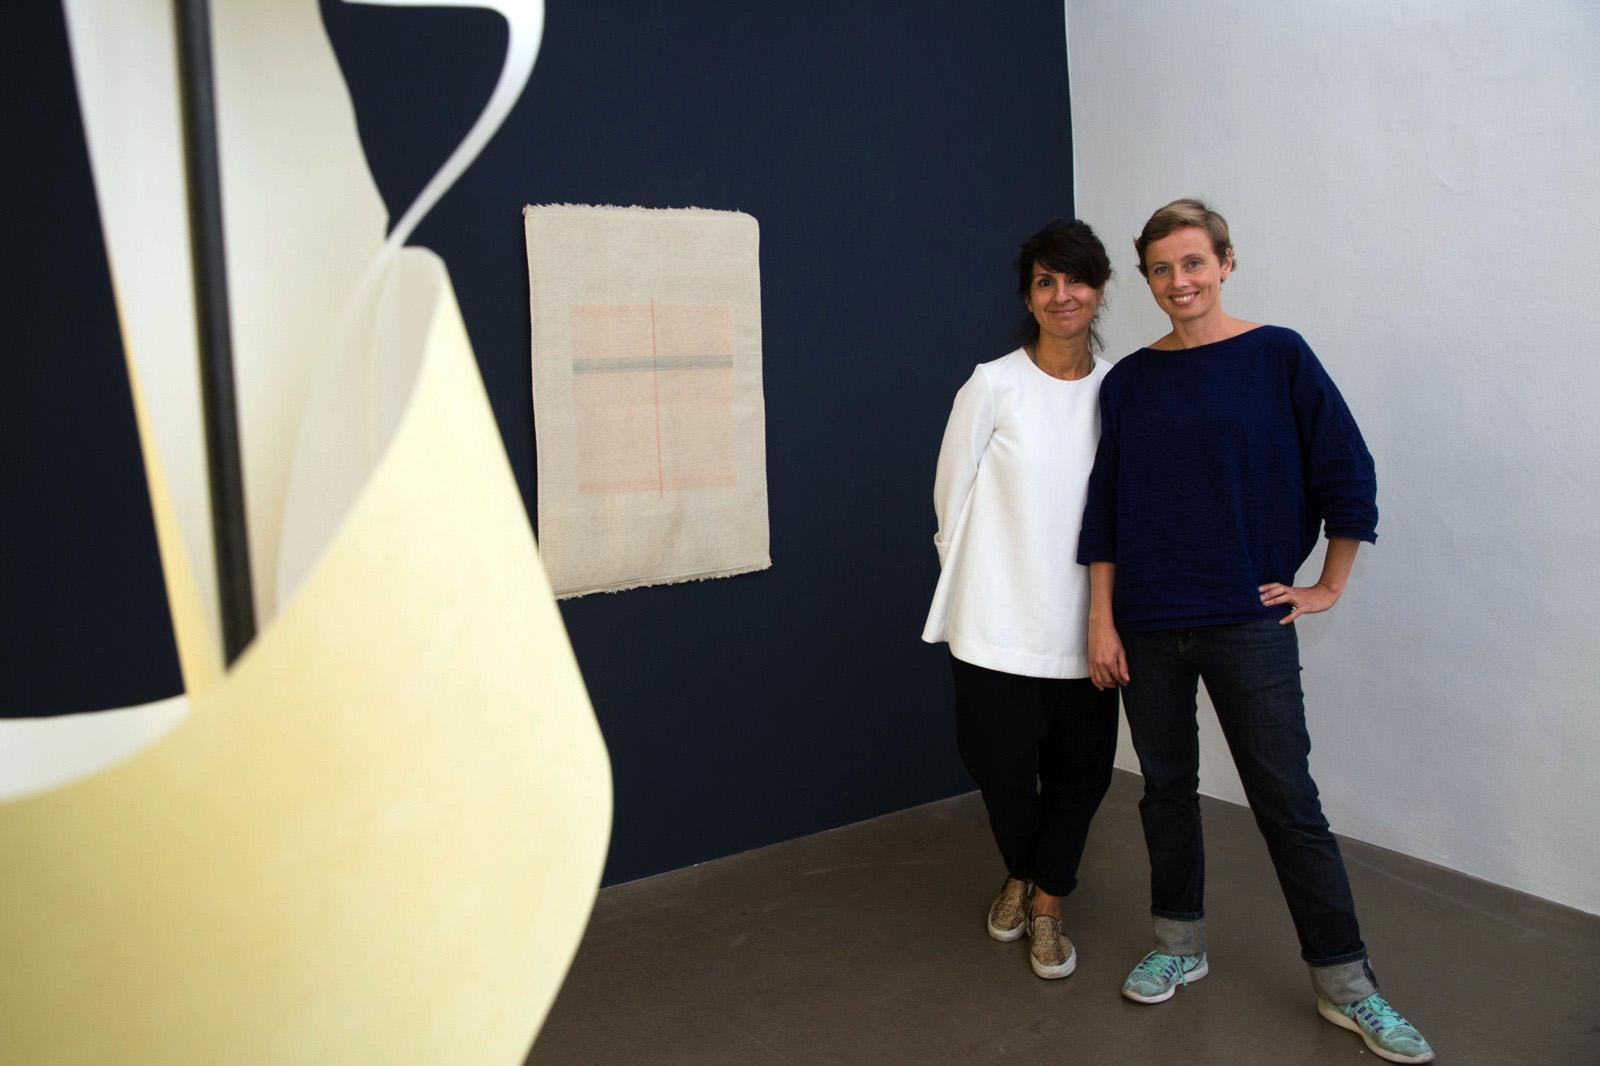 Artists Haleh Redjaian & Sofie Thorsen Krobath Galerie curated byBettina Steinbrügge Photo:eSeL